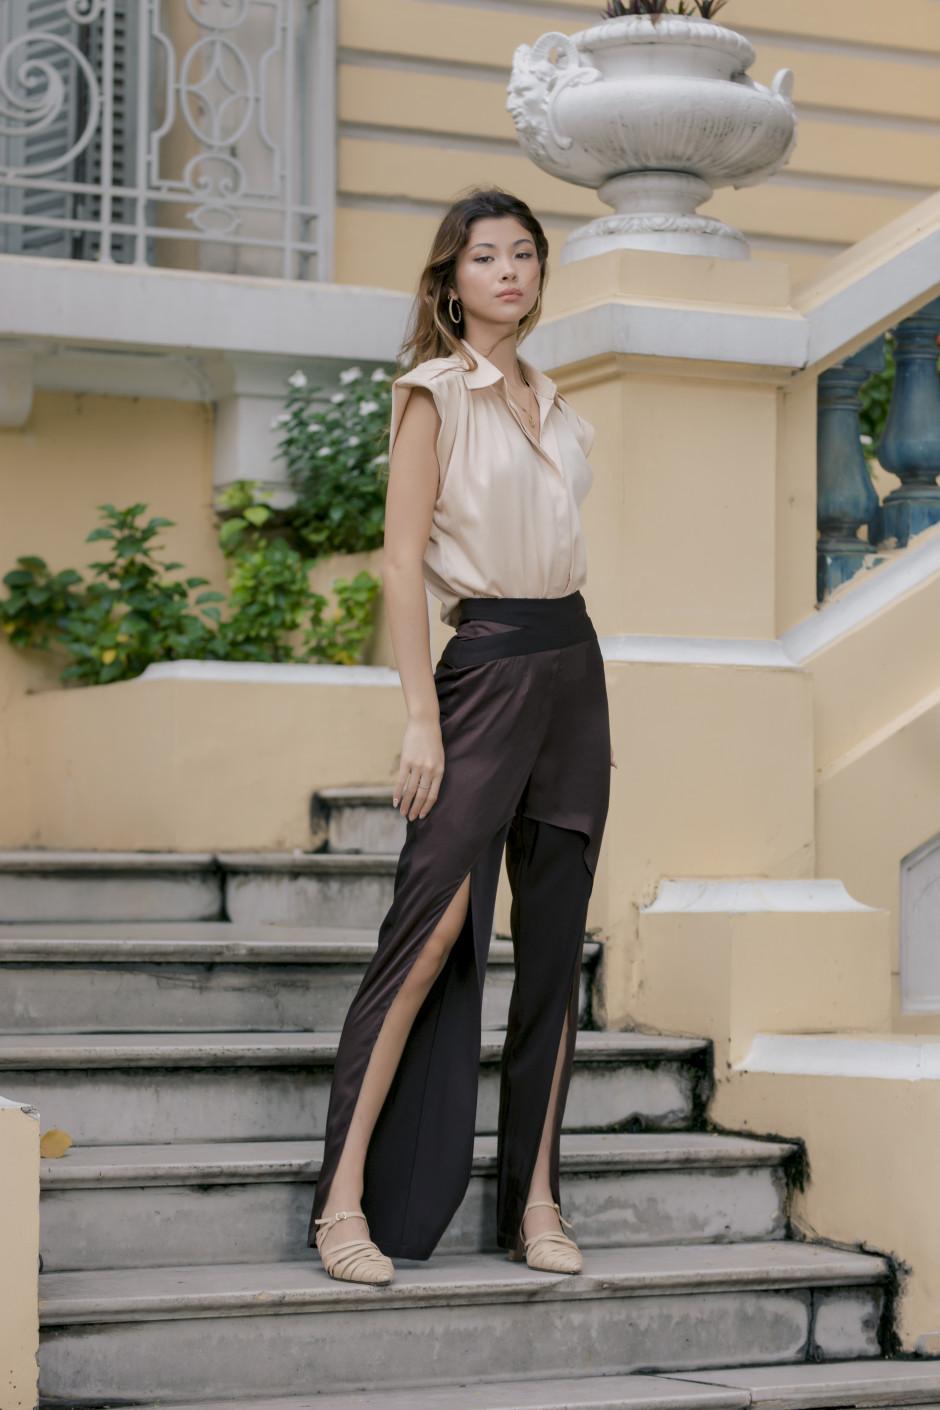 Umber pants